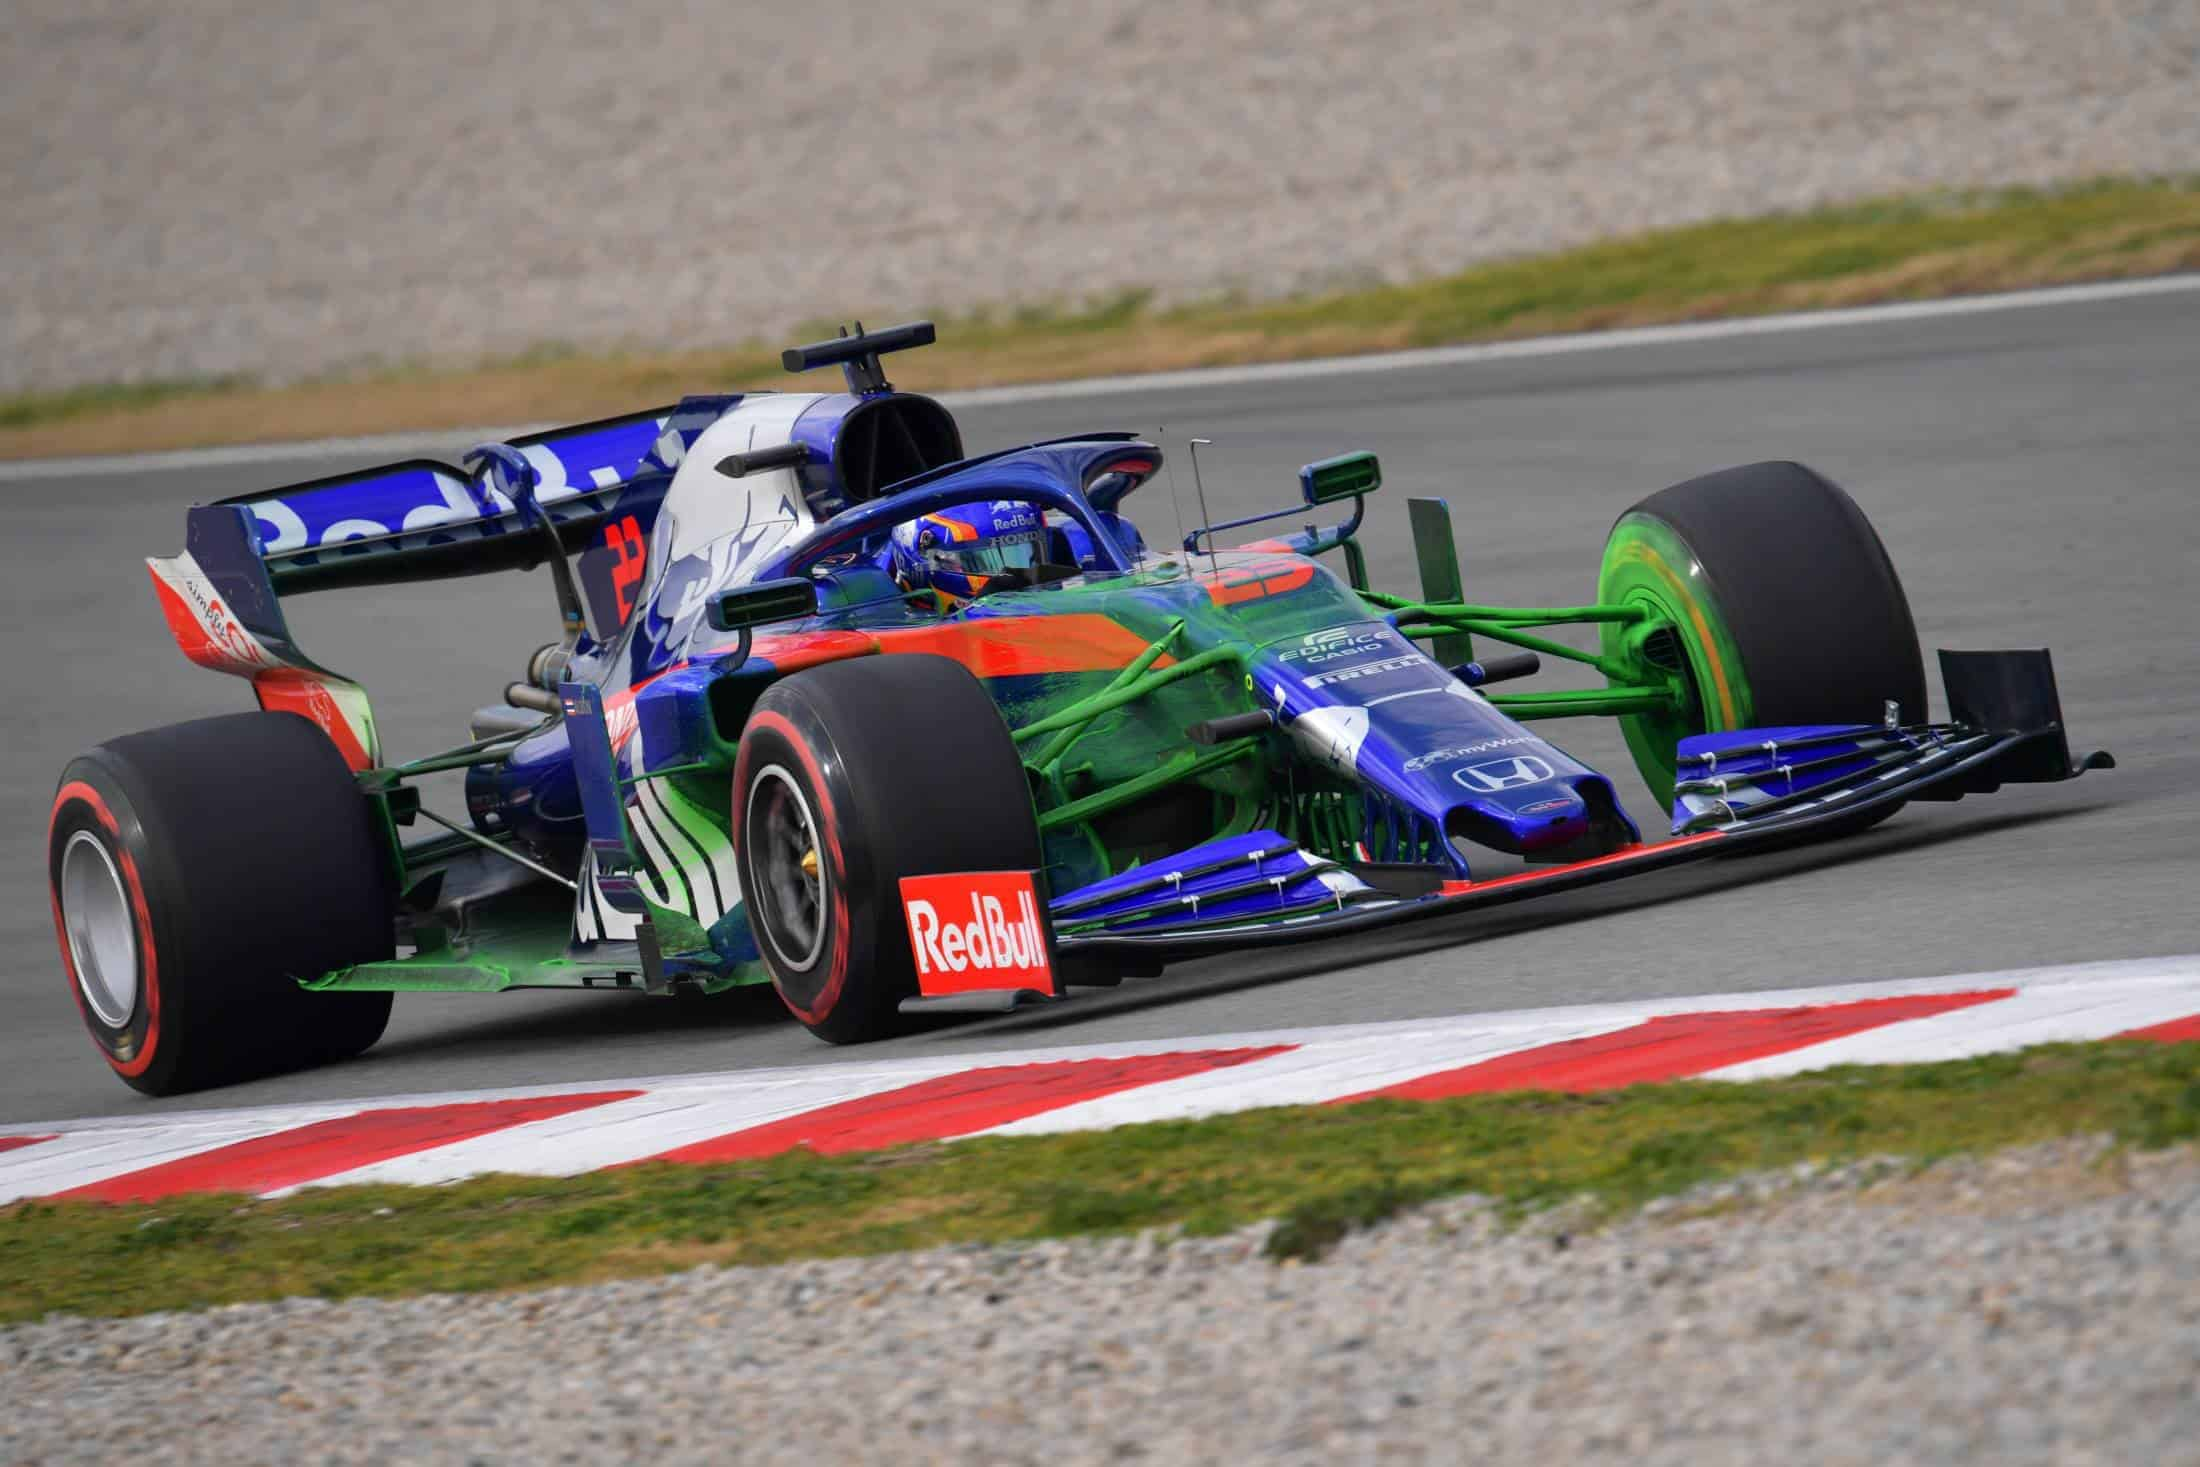 Alexander Albon Toro Rosso Honda STR14 Barcelona Test 1 Day 4 C4 Pirelli tyres Photo Pirelli